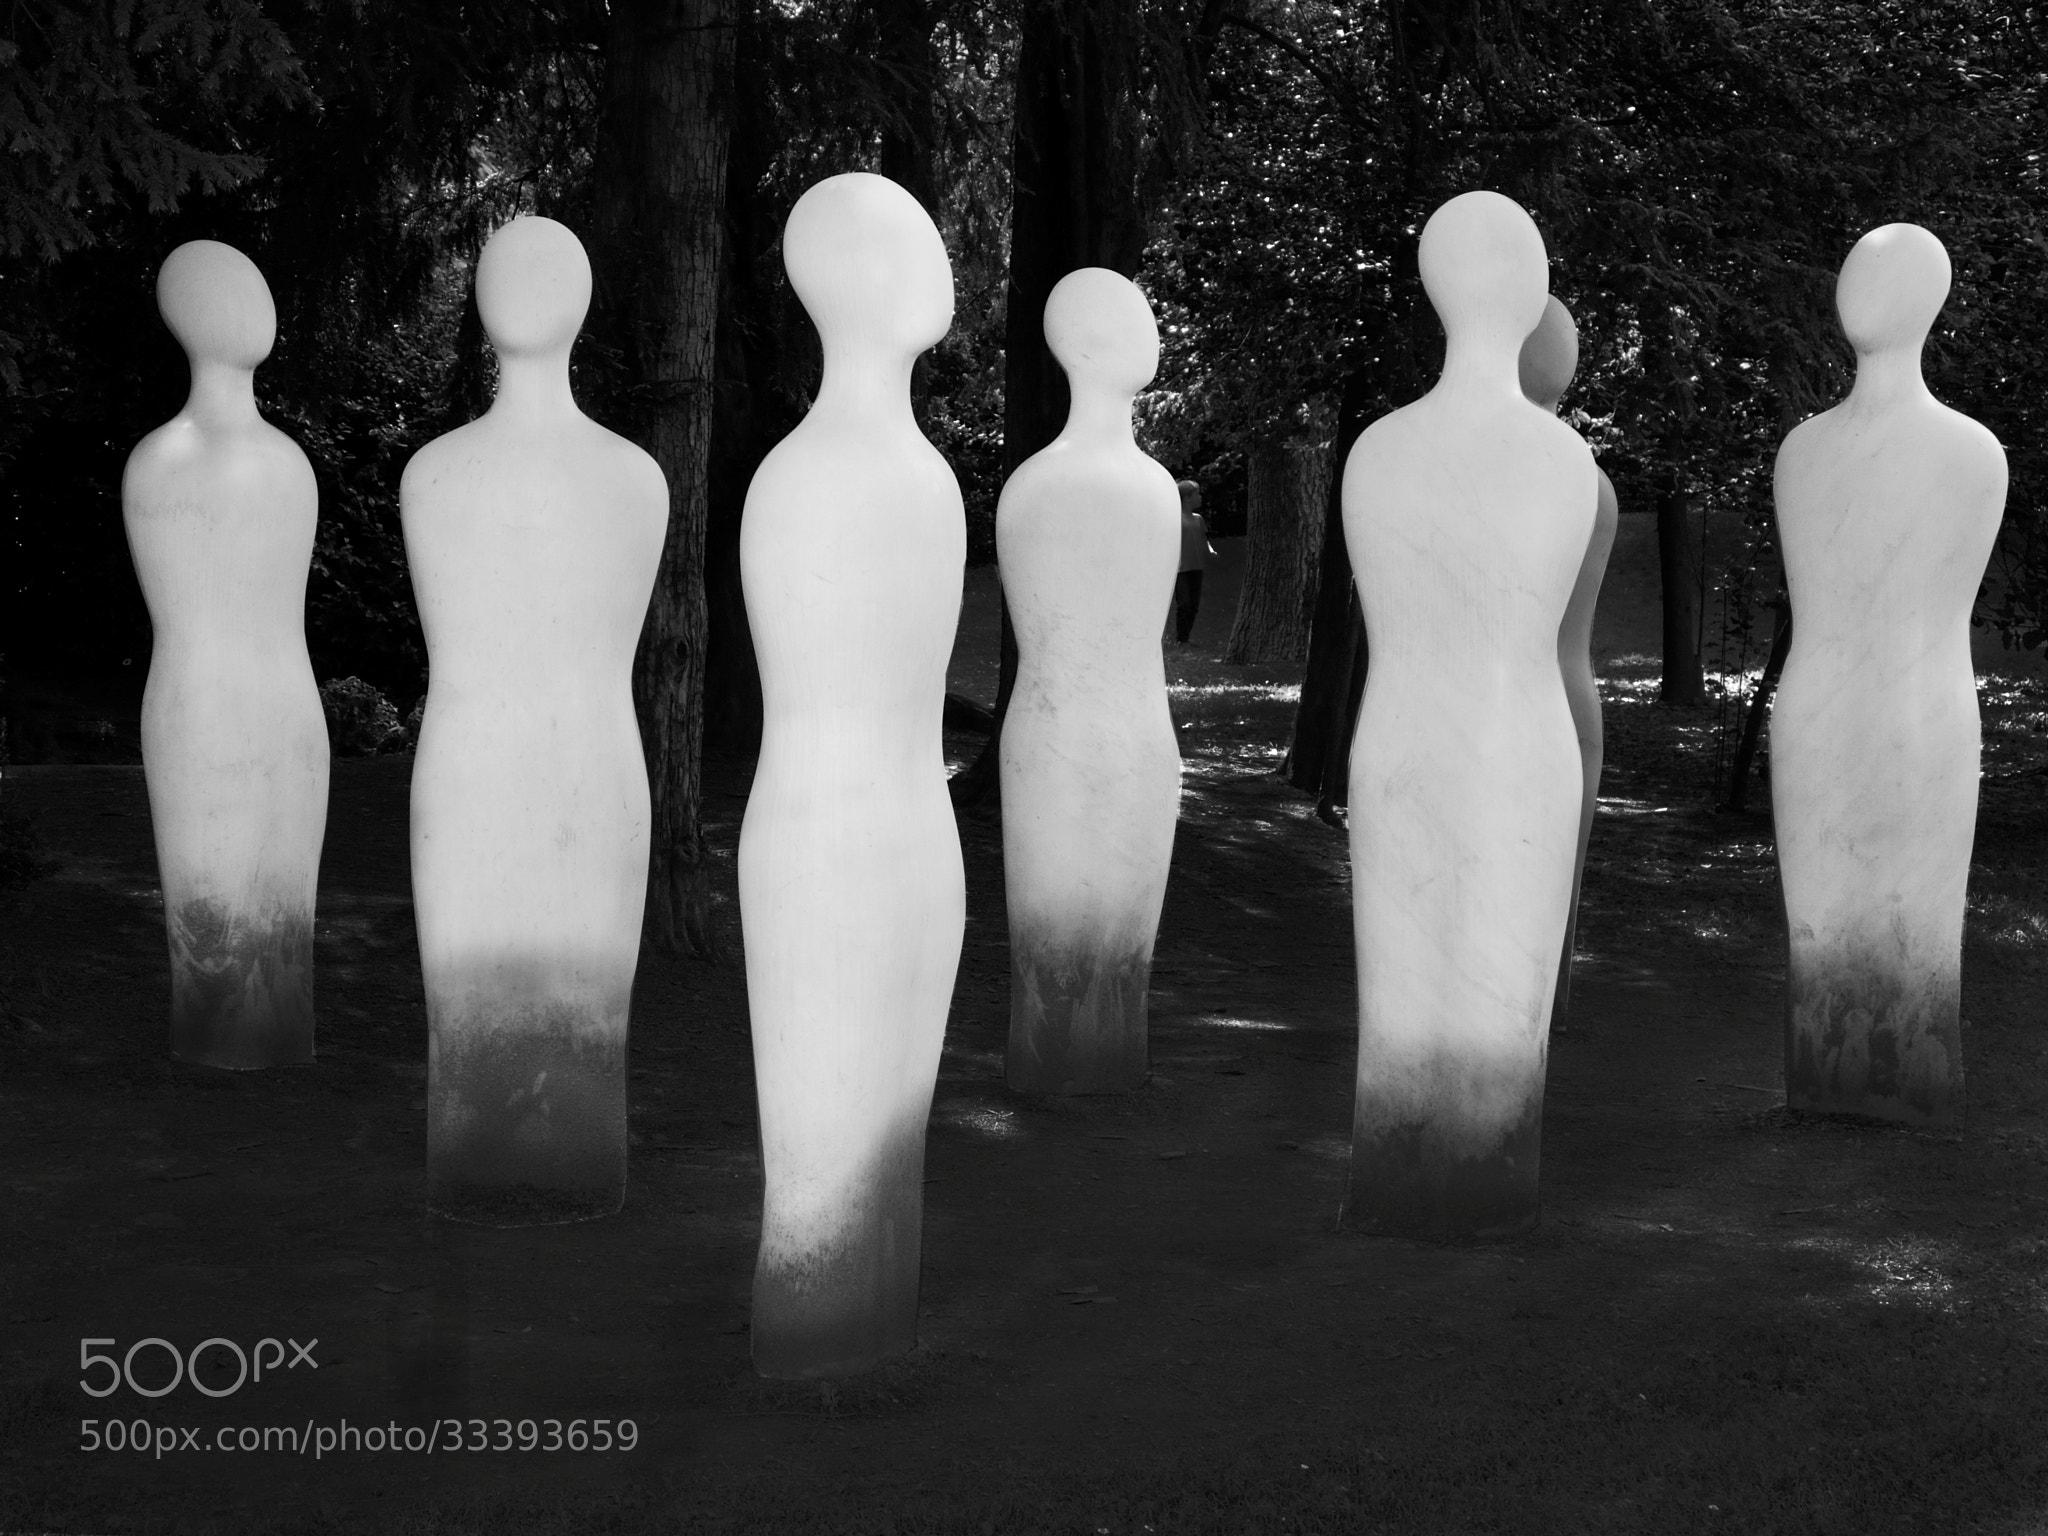 Photograph 7 by giorgio angilella on 500px